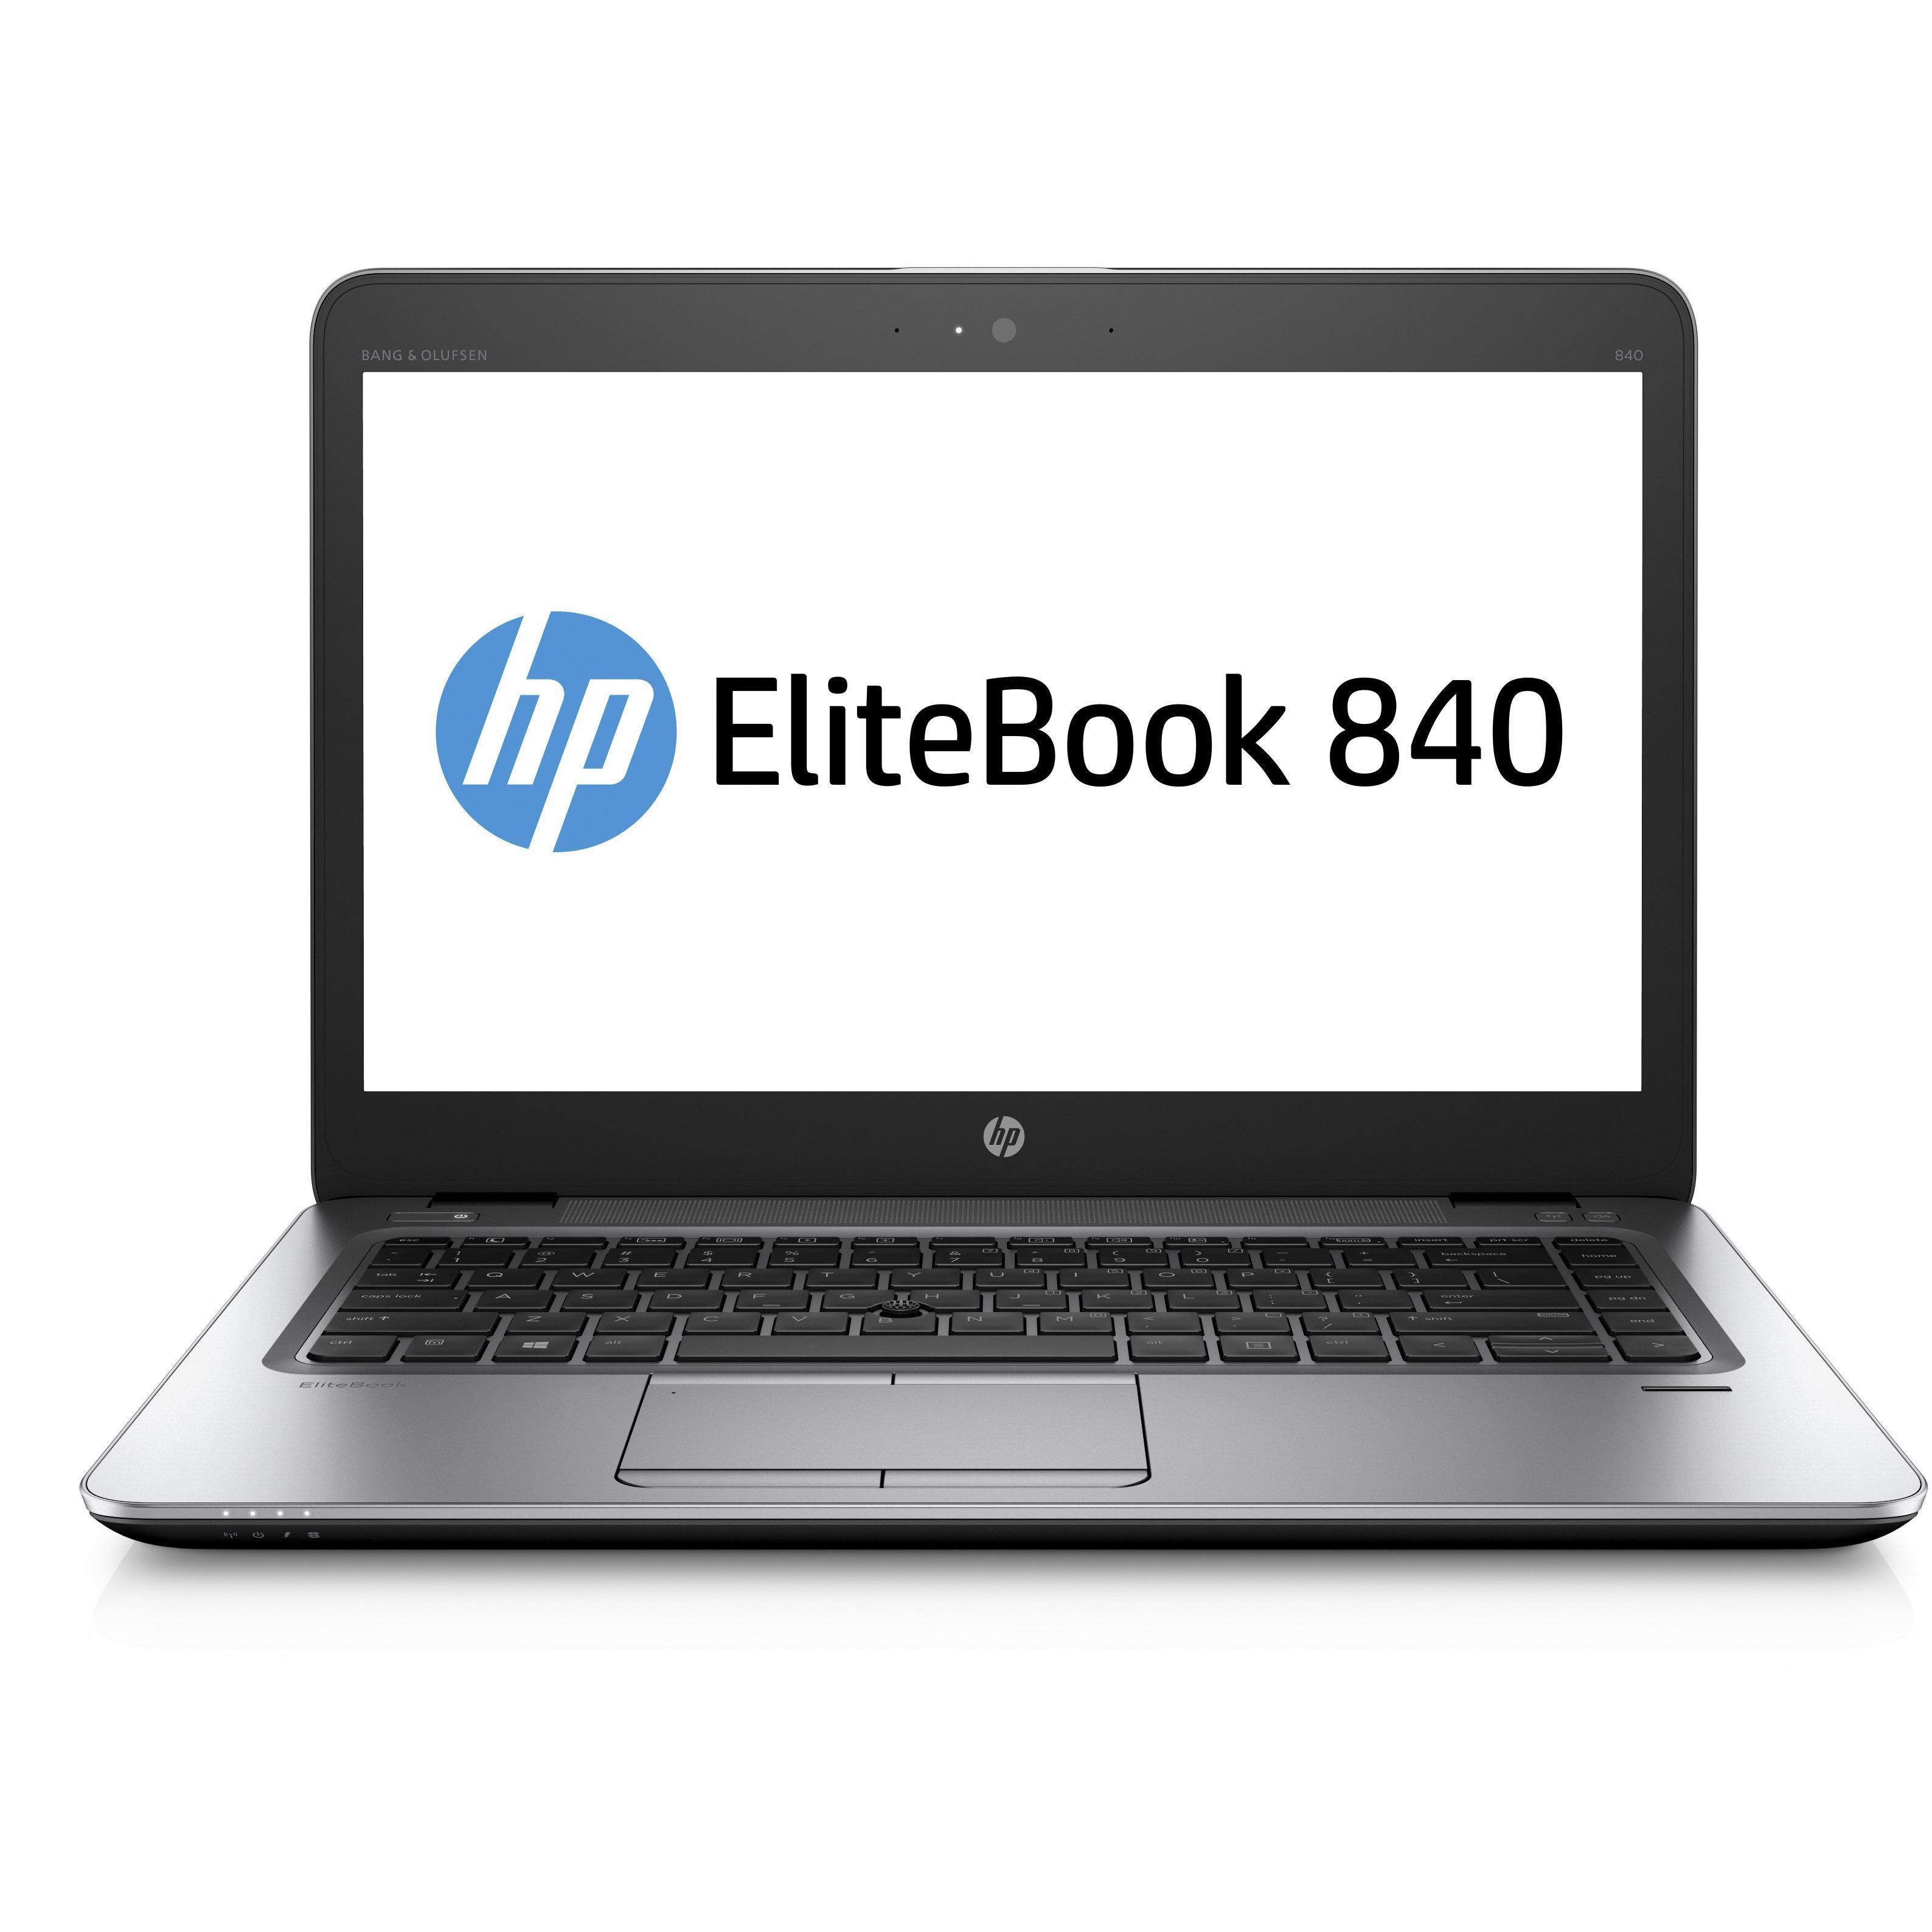 Hp EliteBook 840 G3 14-inch (2016) - Core i7-6600U - 16 GB - SSD 512 GB